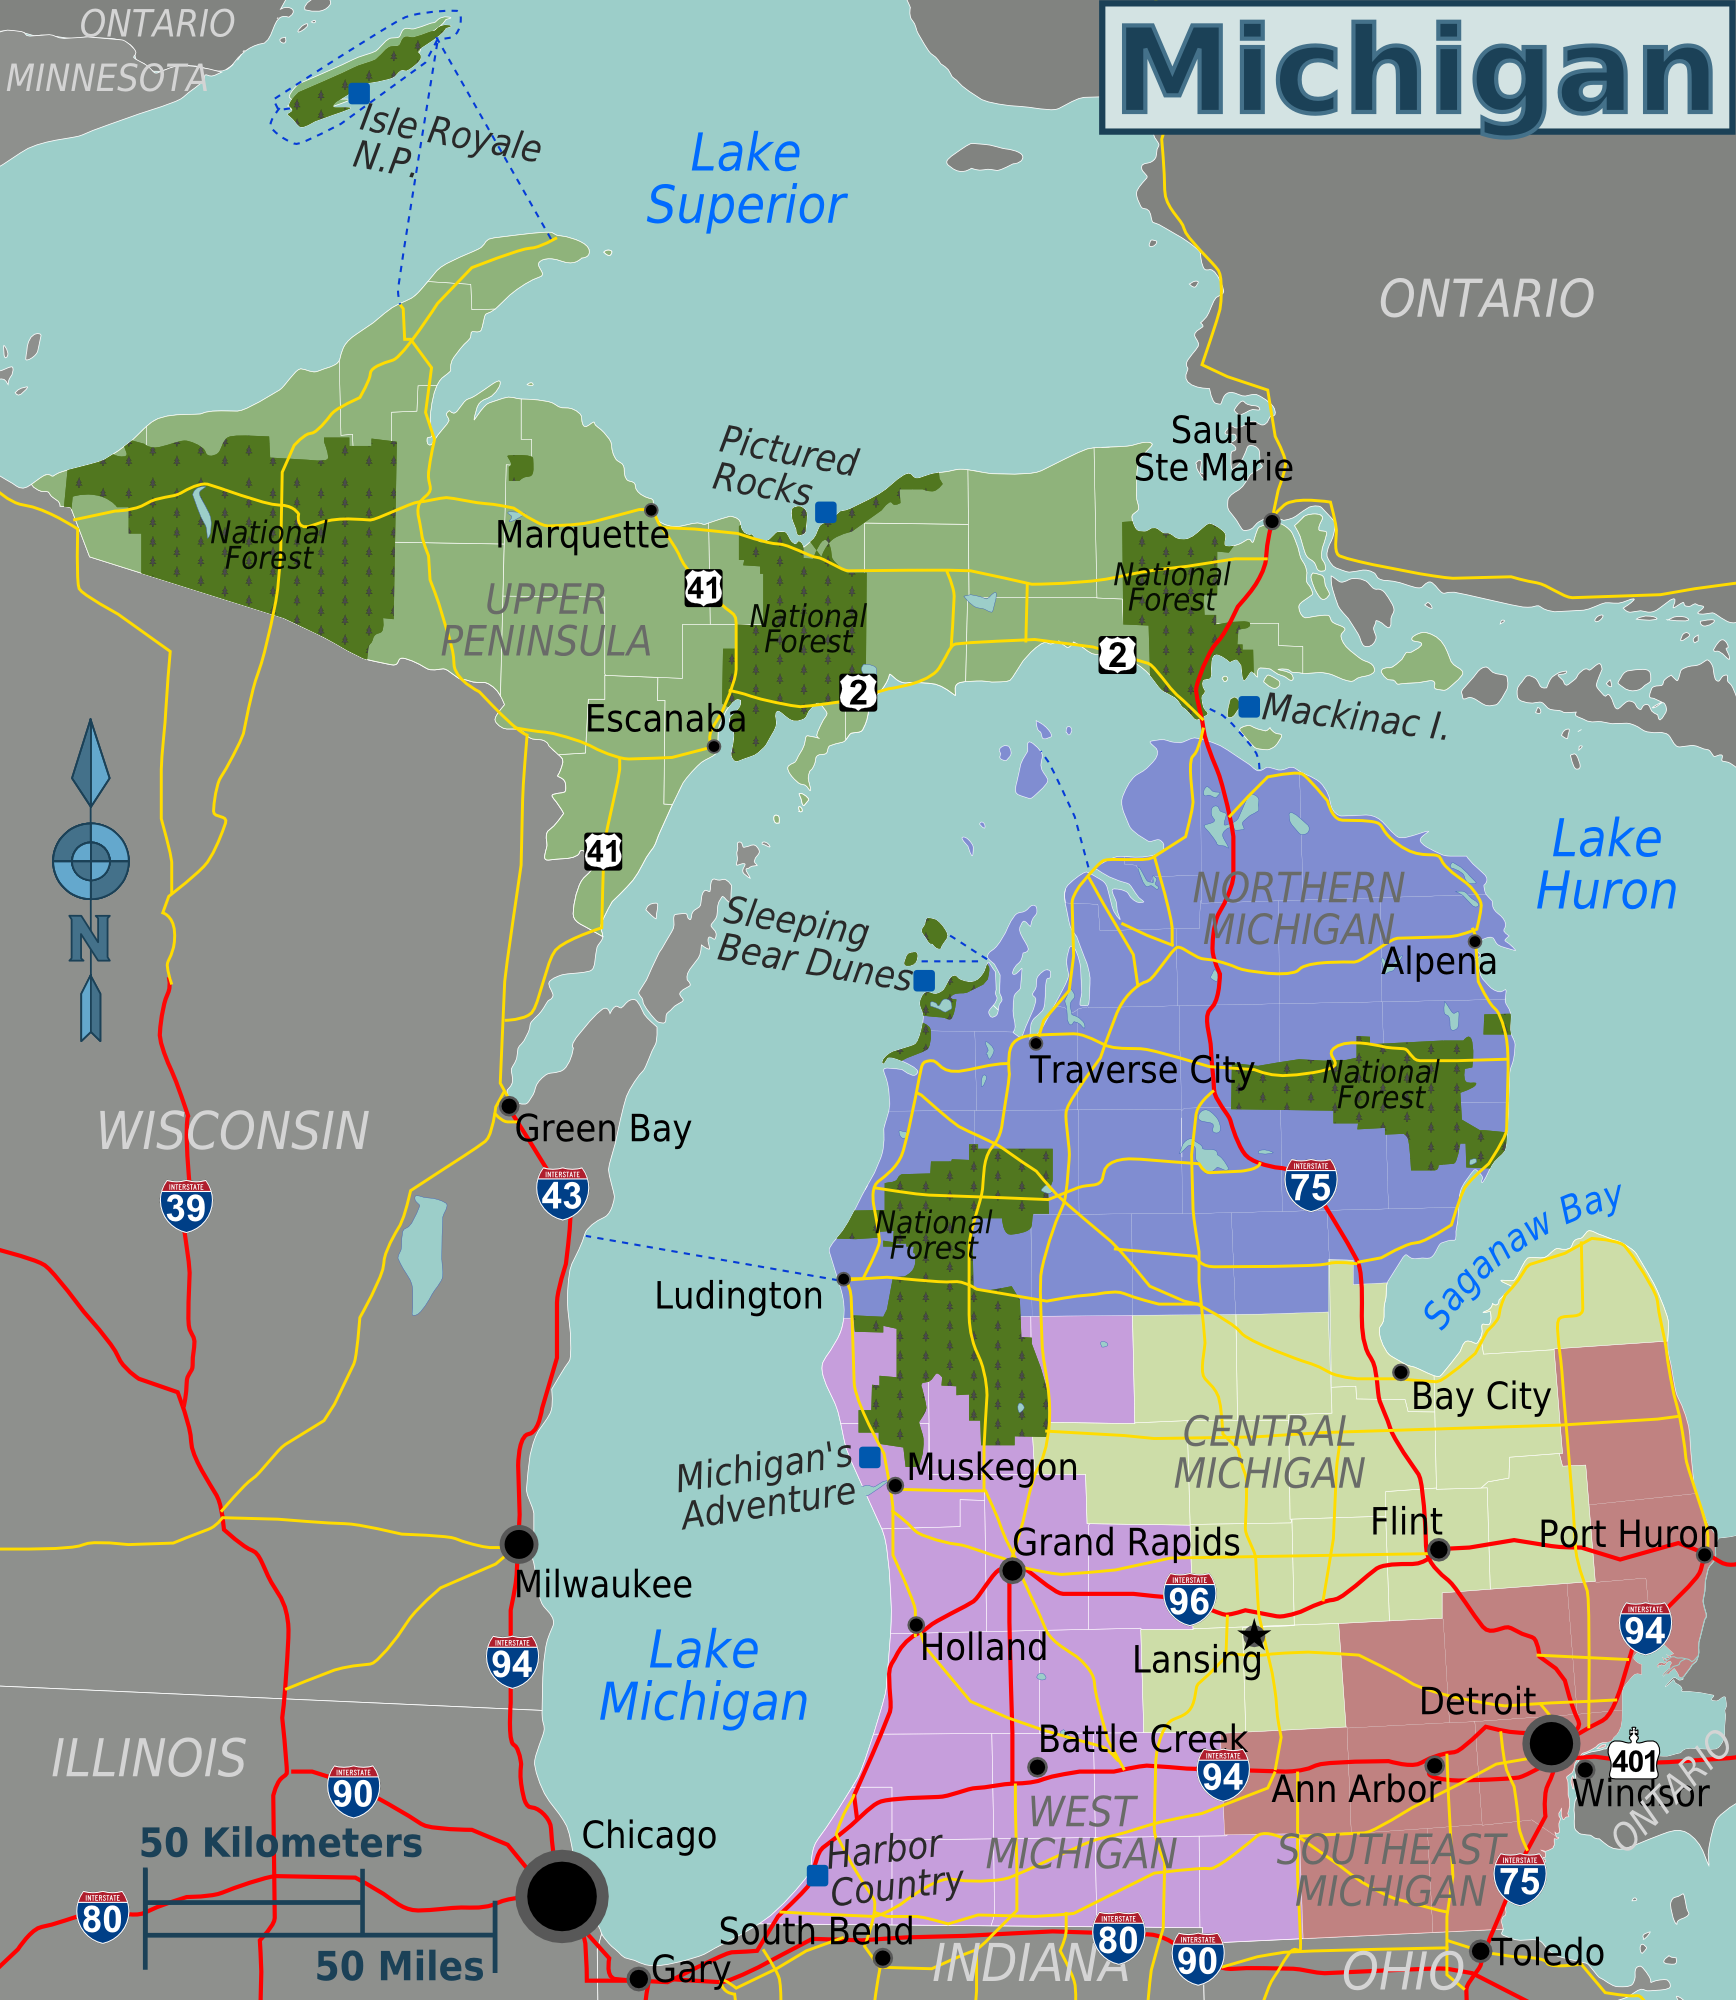 michigan karte File:Michigan regions map.png   Wikimedia Commons michigan karte